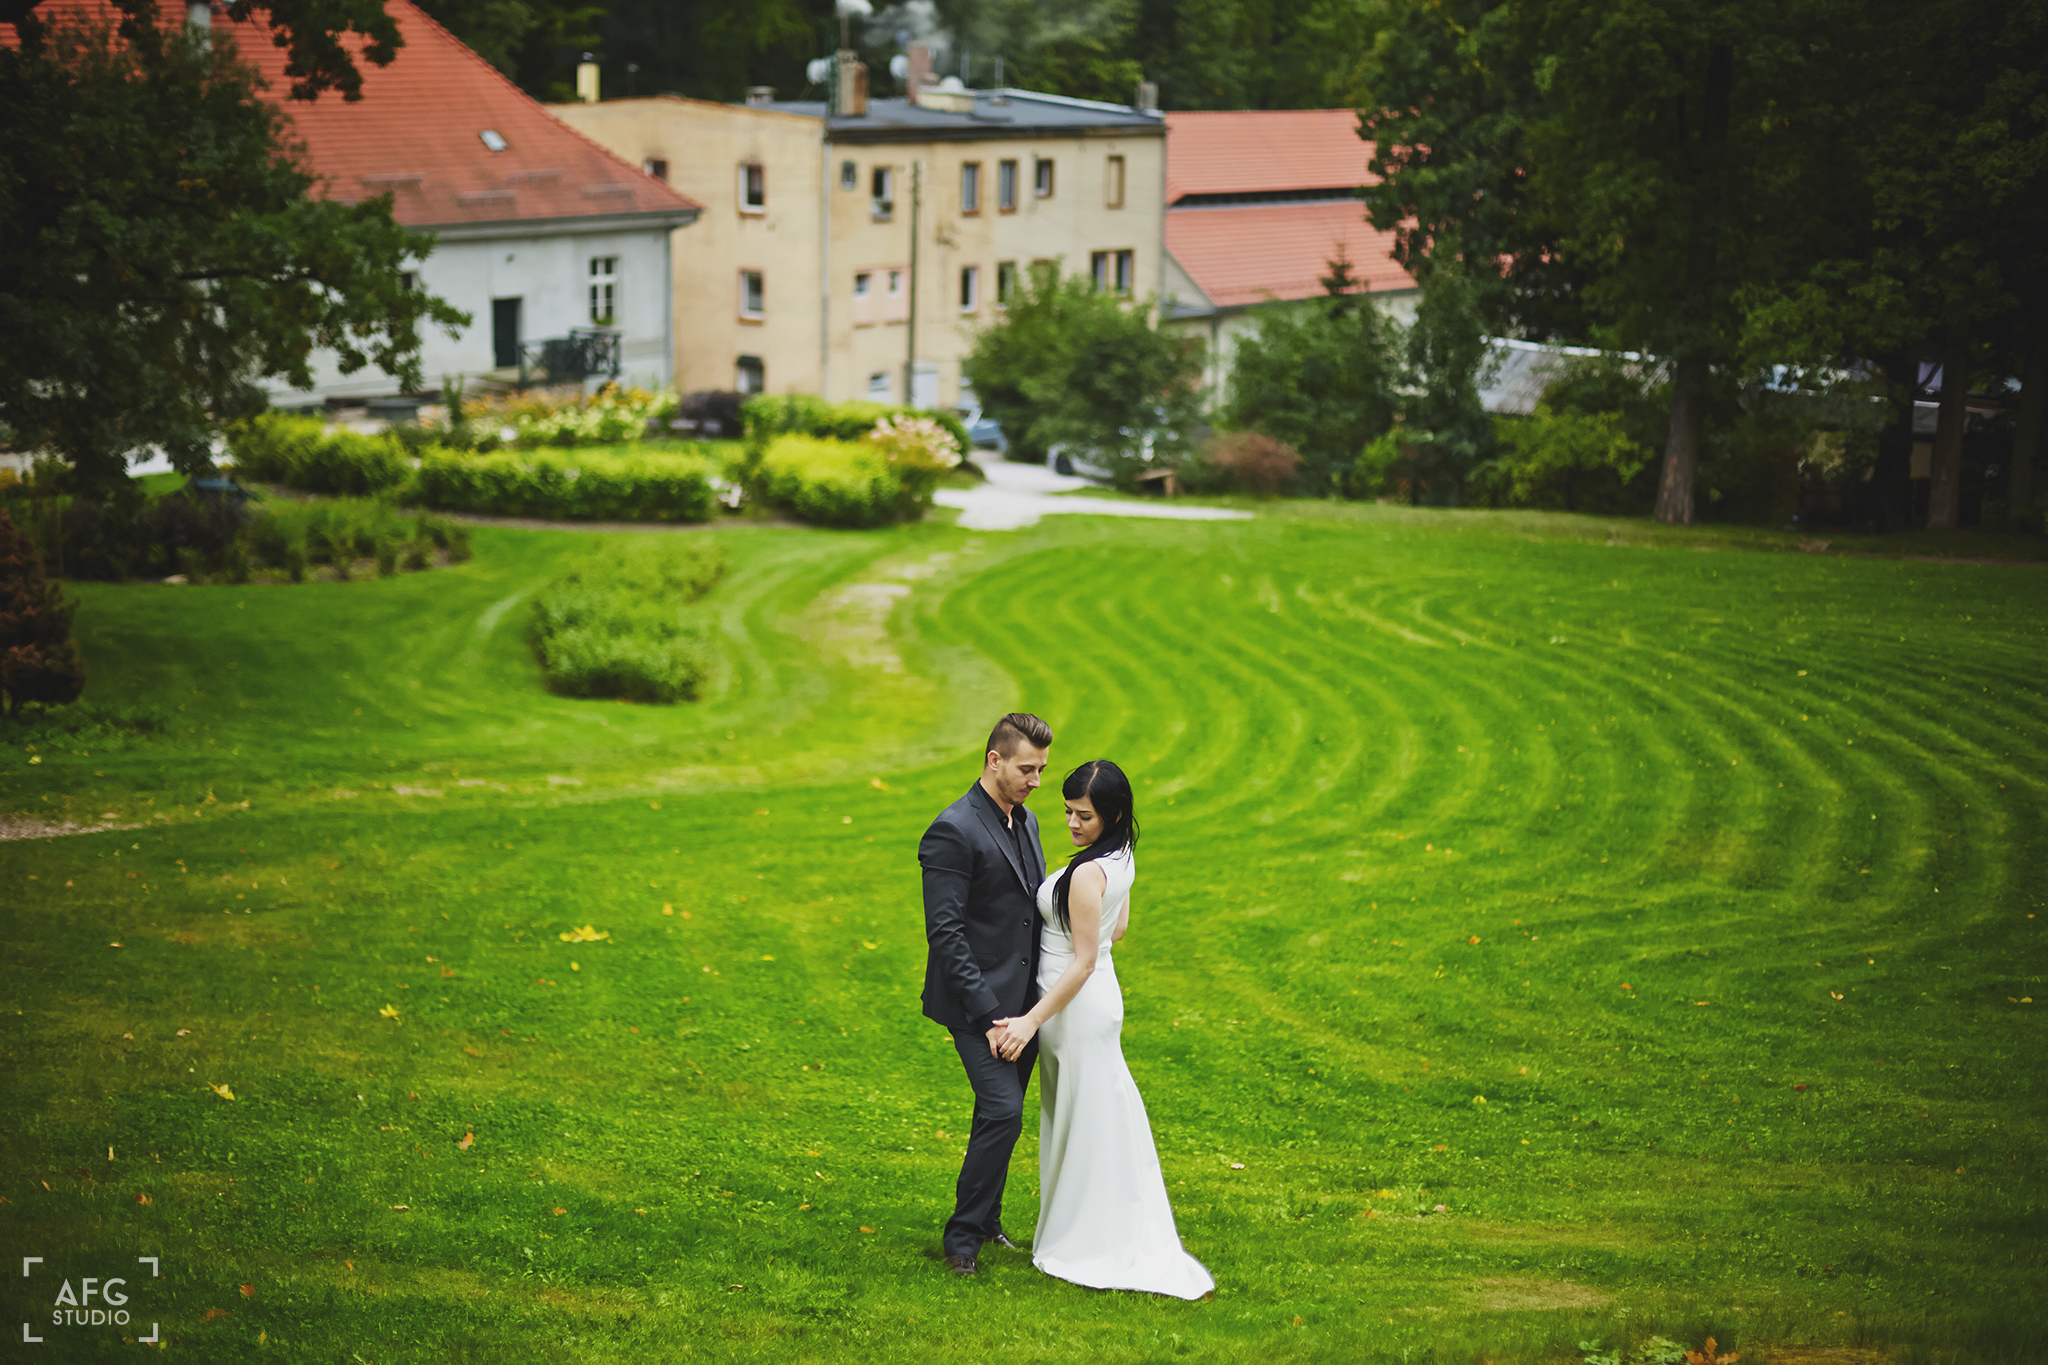 pole, suknia ślubna, domy